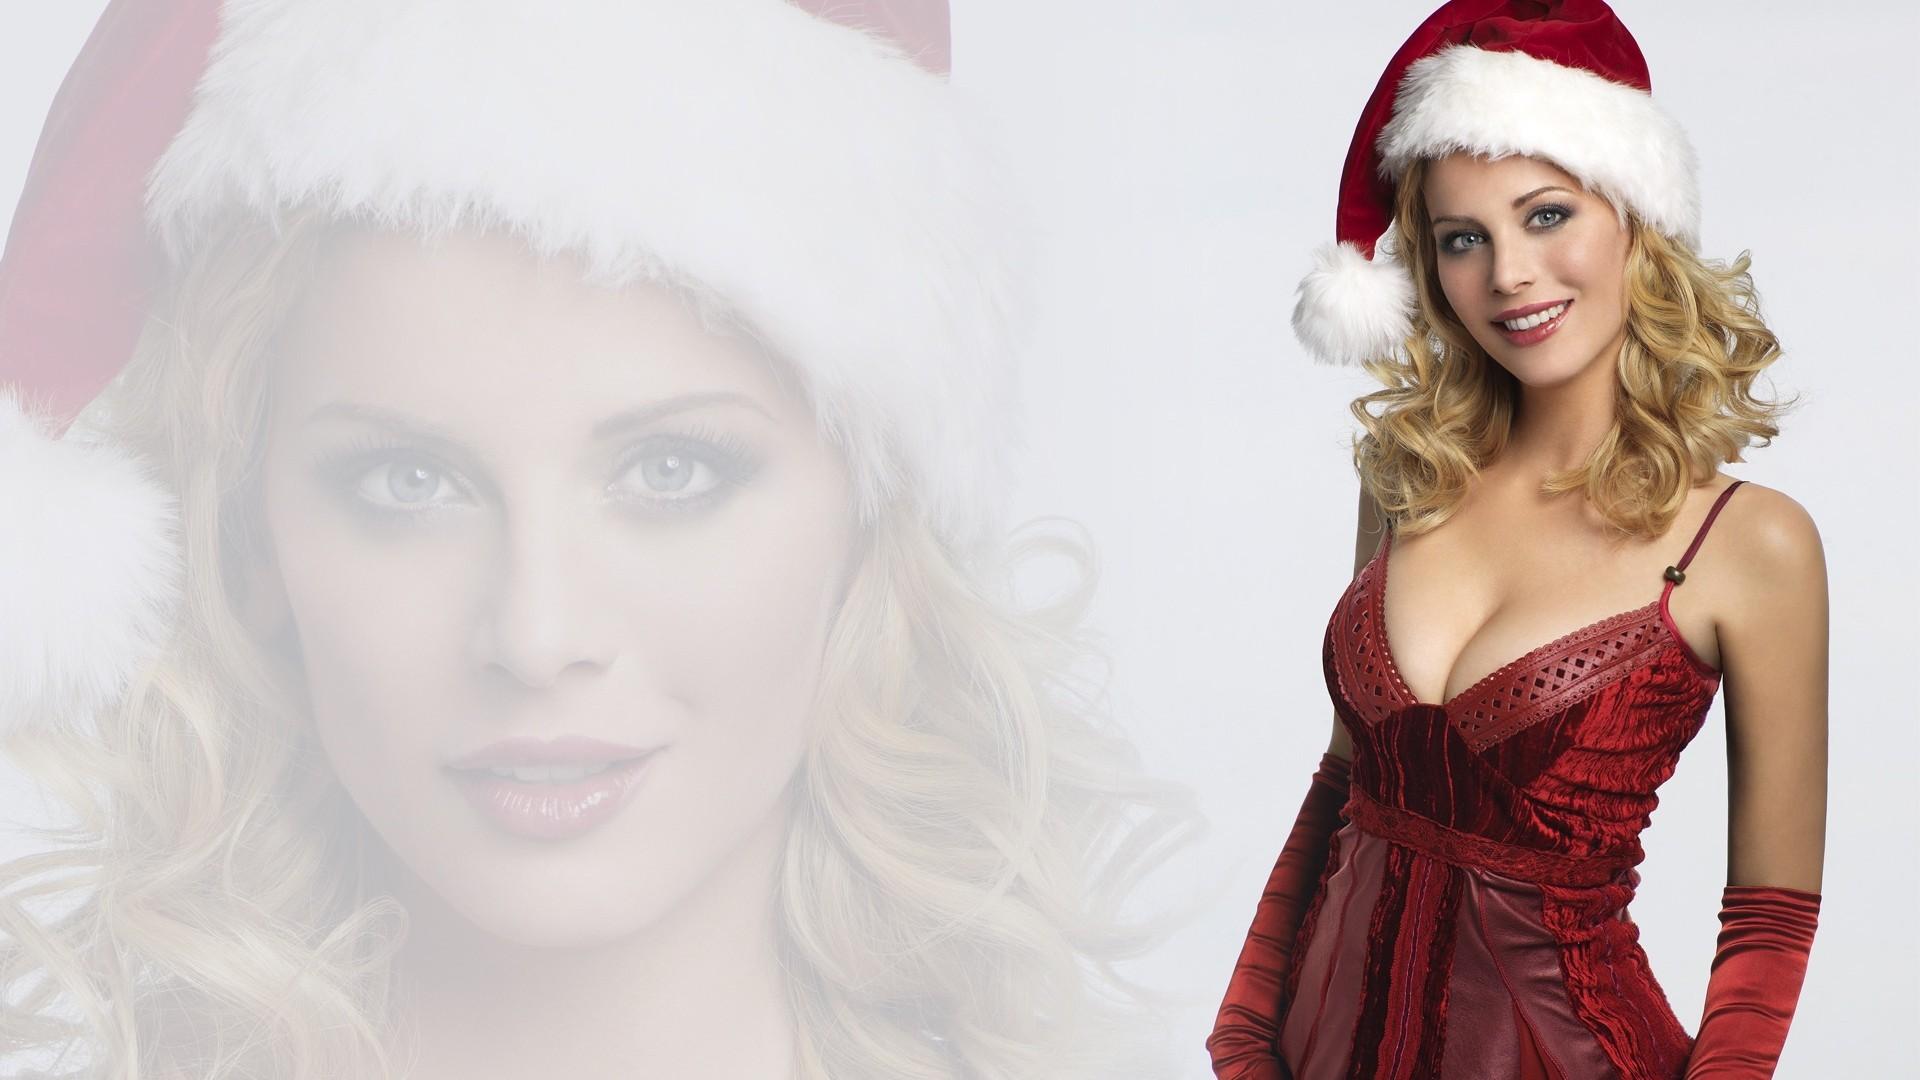 Sexy Christmas Girl Free Stock Photos